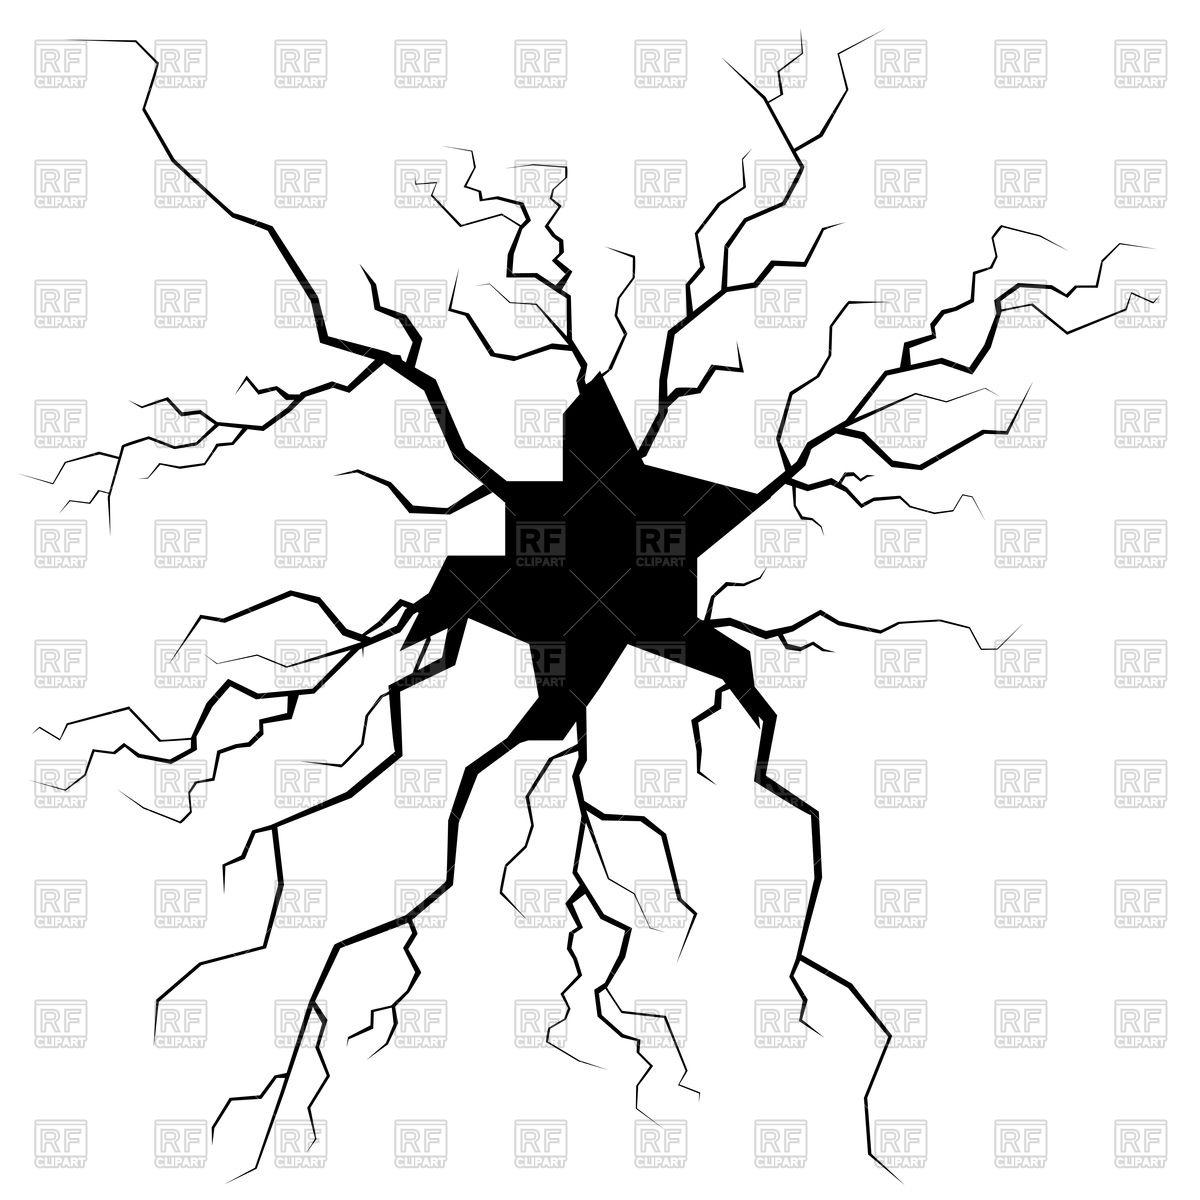 1200x1200 Crack For Disaster Design Vector Image Vector Artwork Of Design